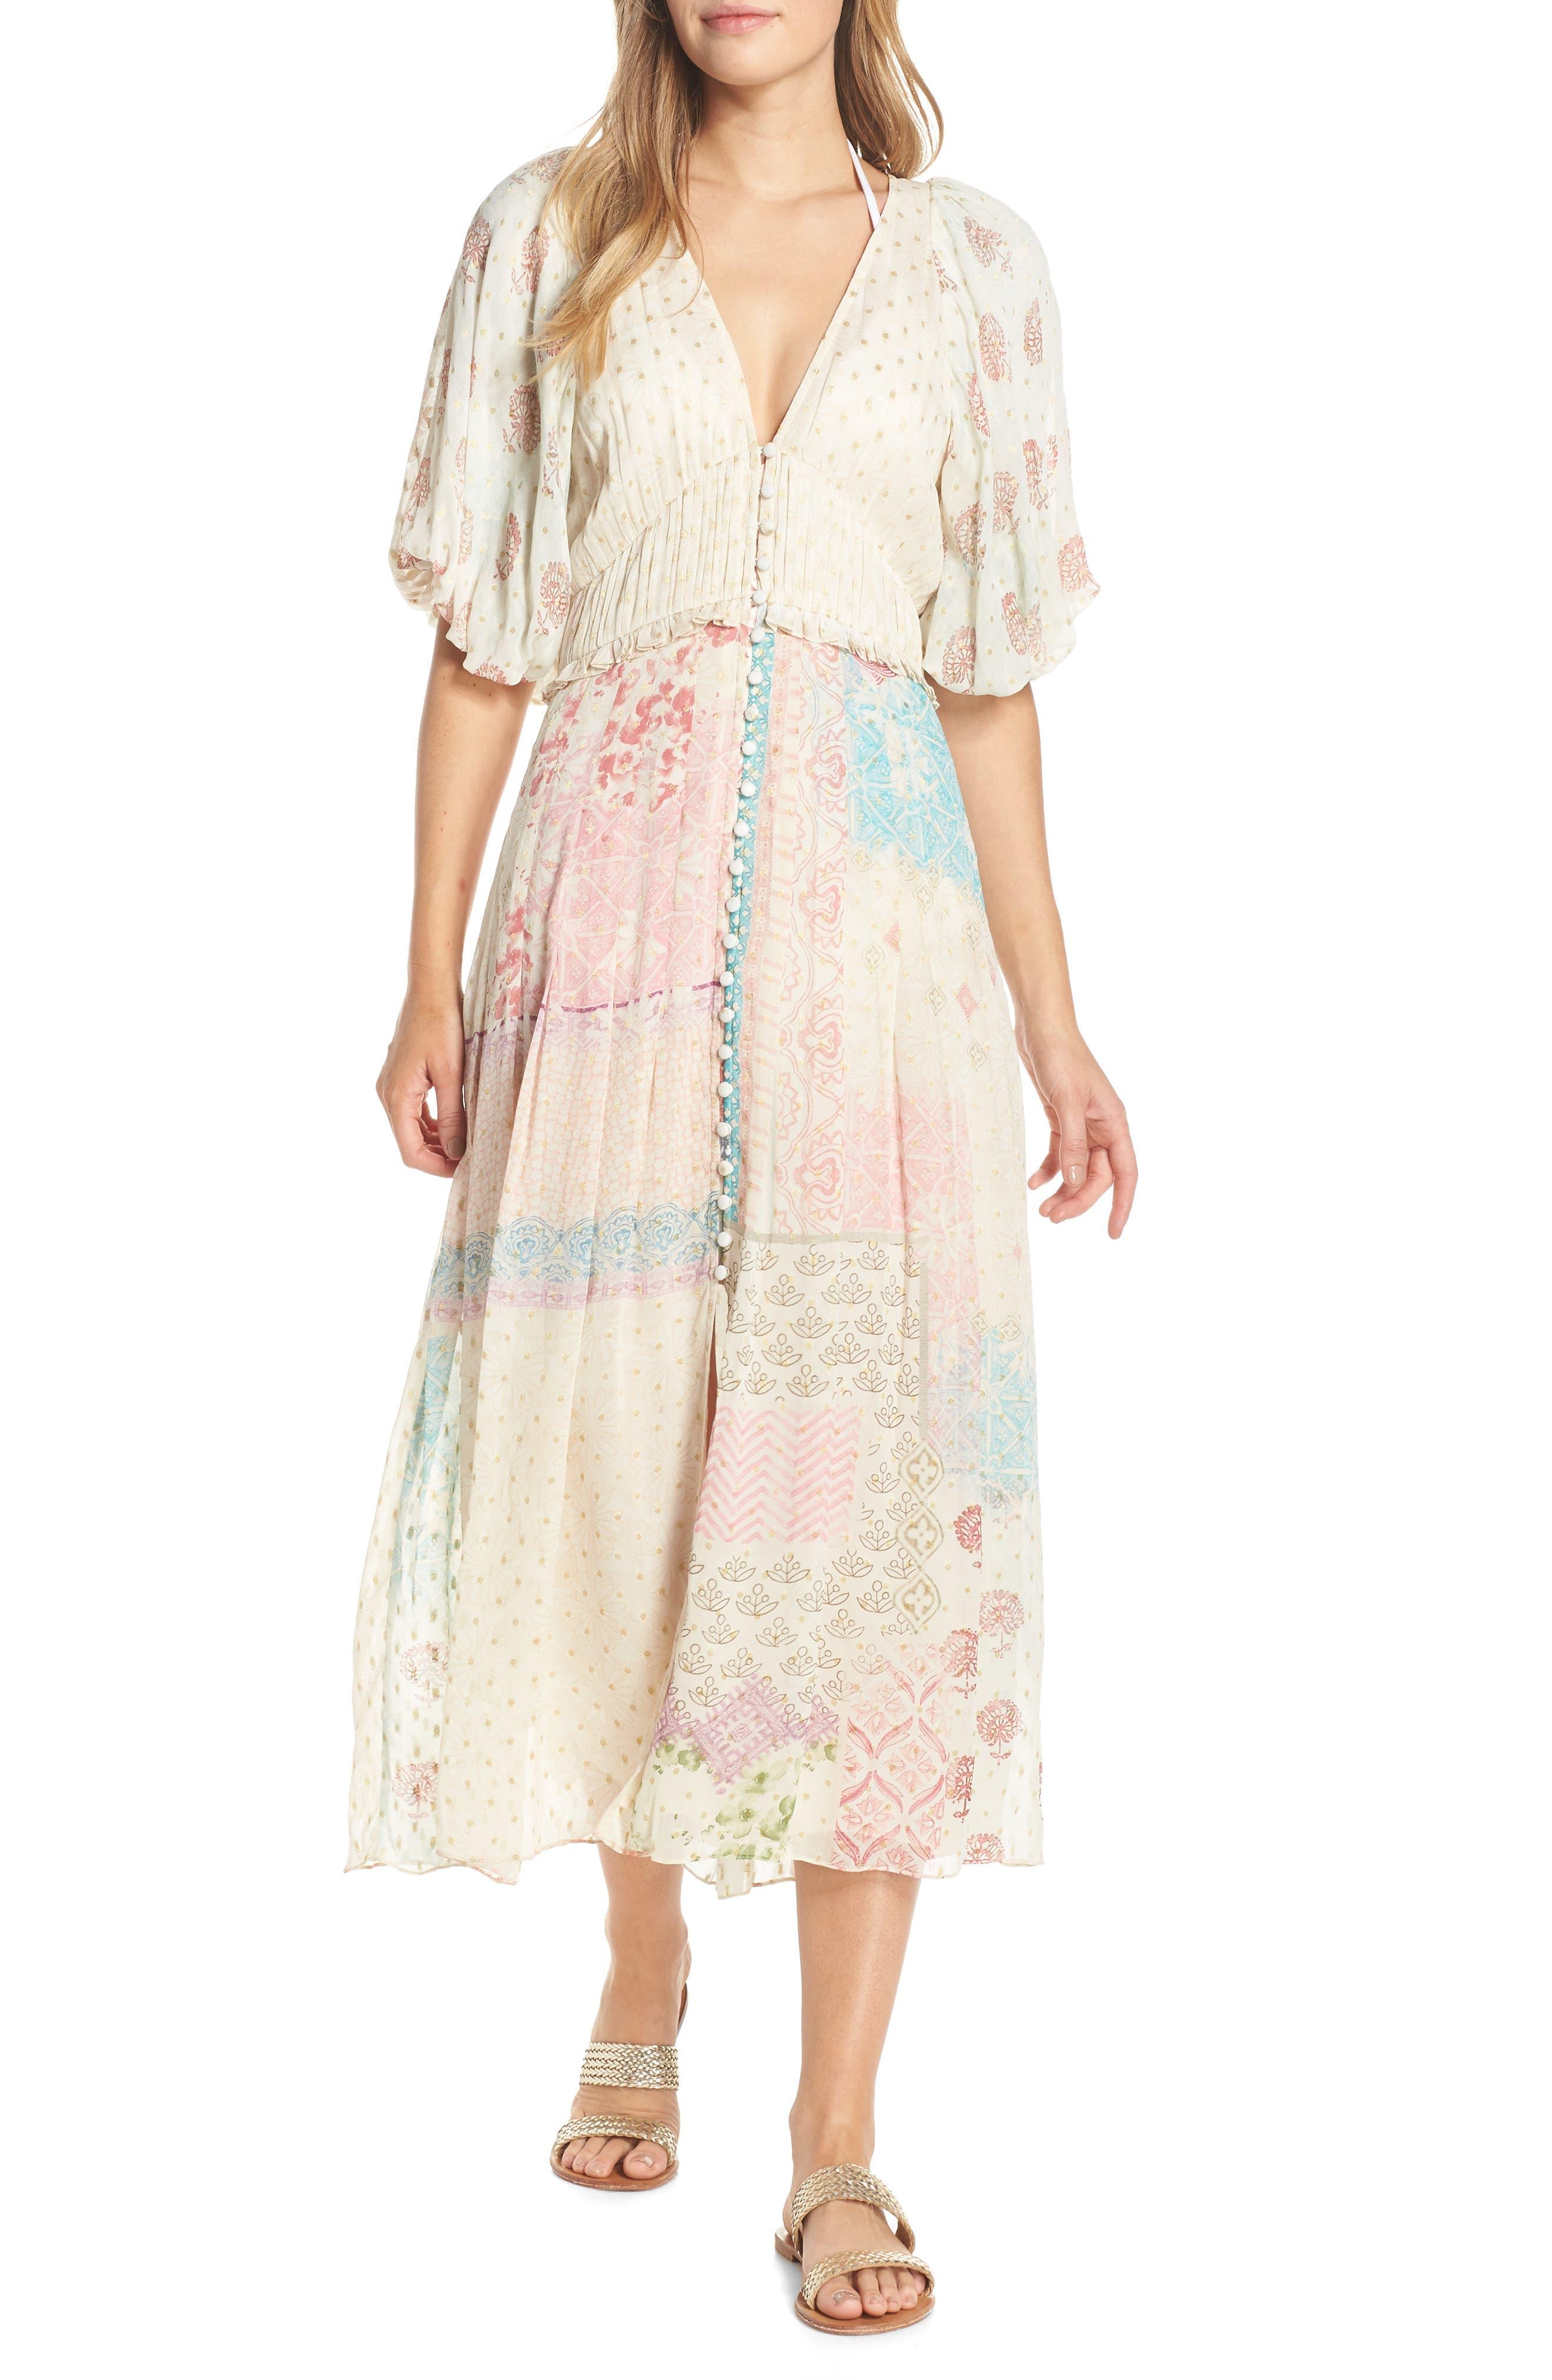 HEMANT & NANDITA, Cover-Up Maxi Dress, Main thumbnail 1, color, PASTEL